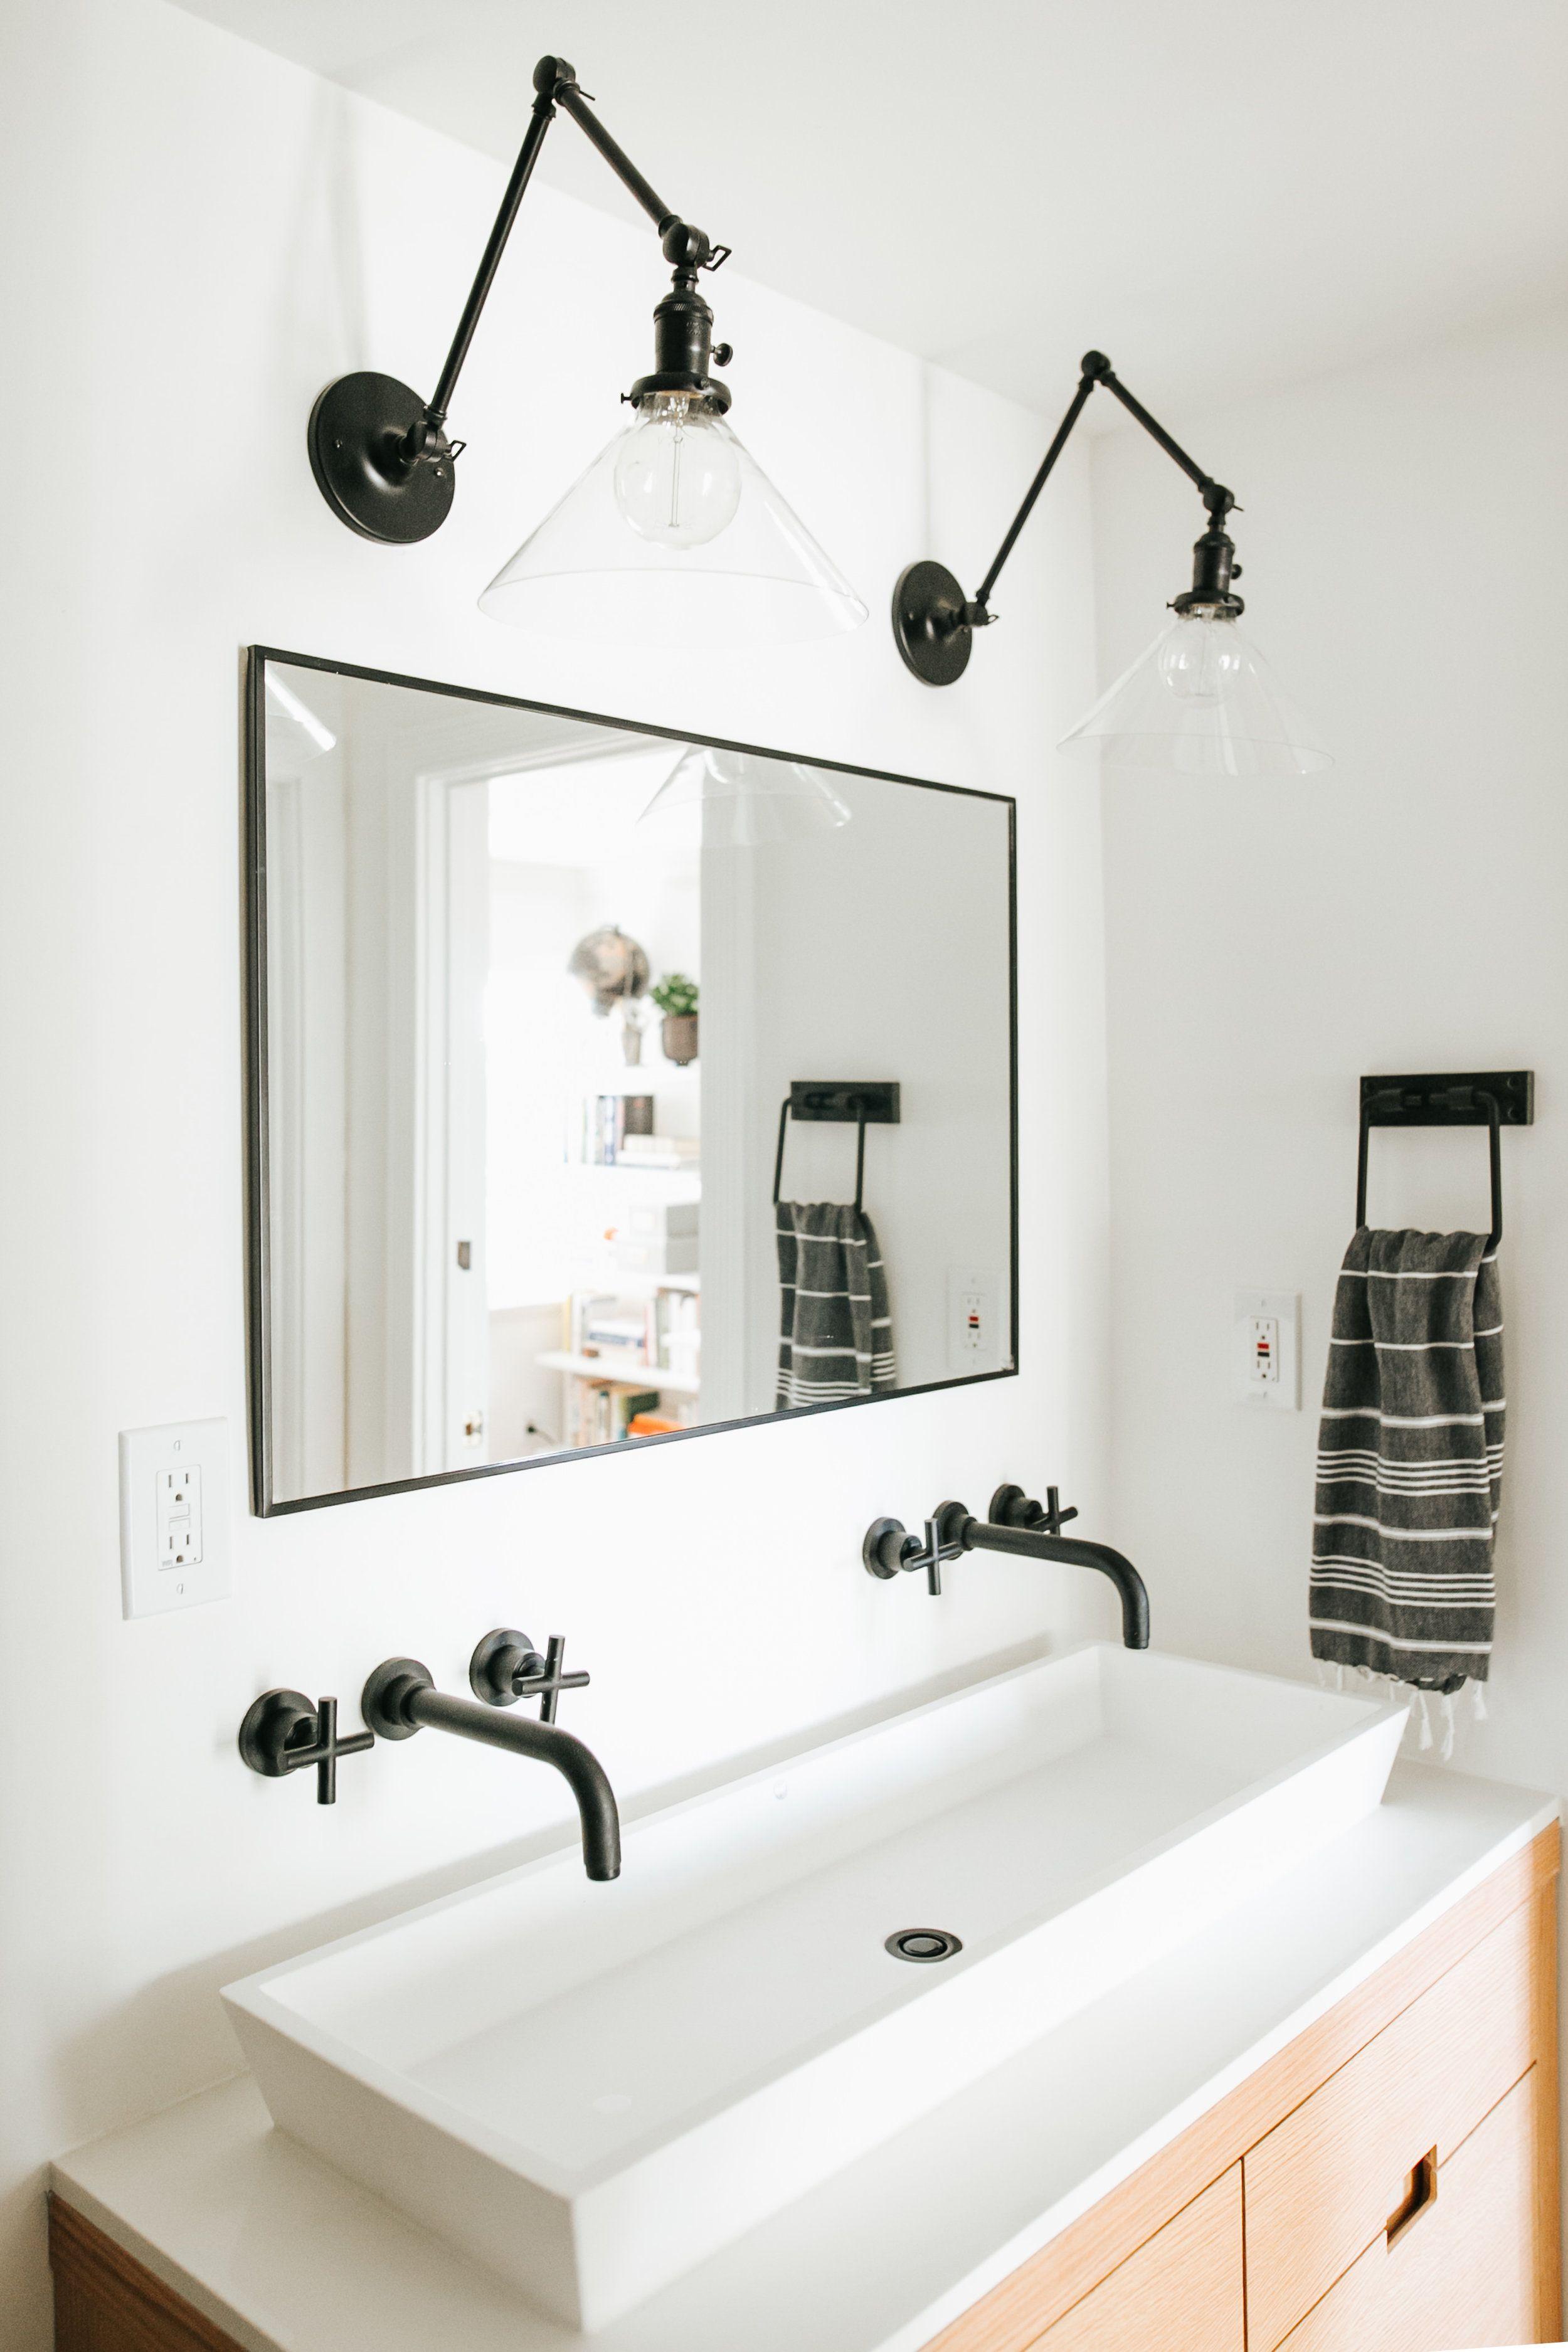 Before After The Making Of A Master Bathroom Black Faucet Bathroom Bathroom Sconces Modern Bathroom Light Fixtures